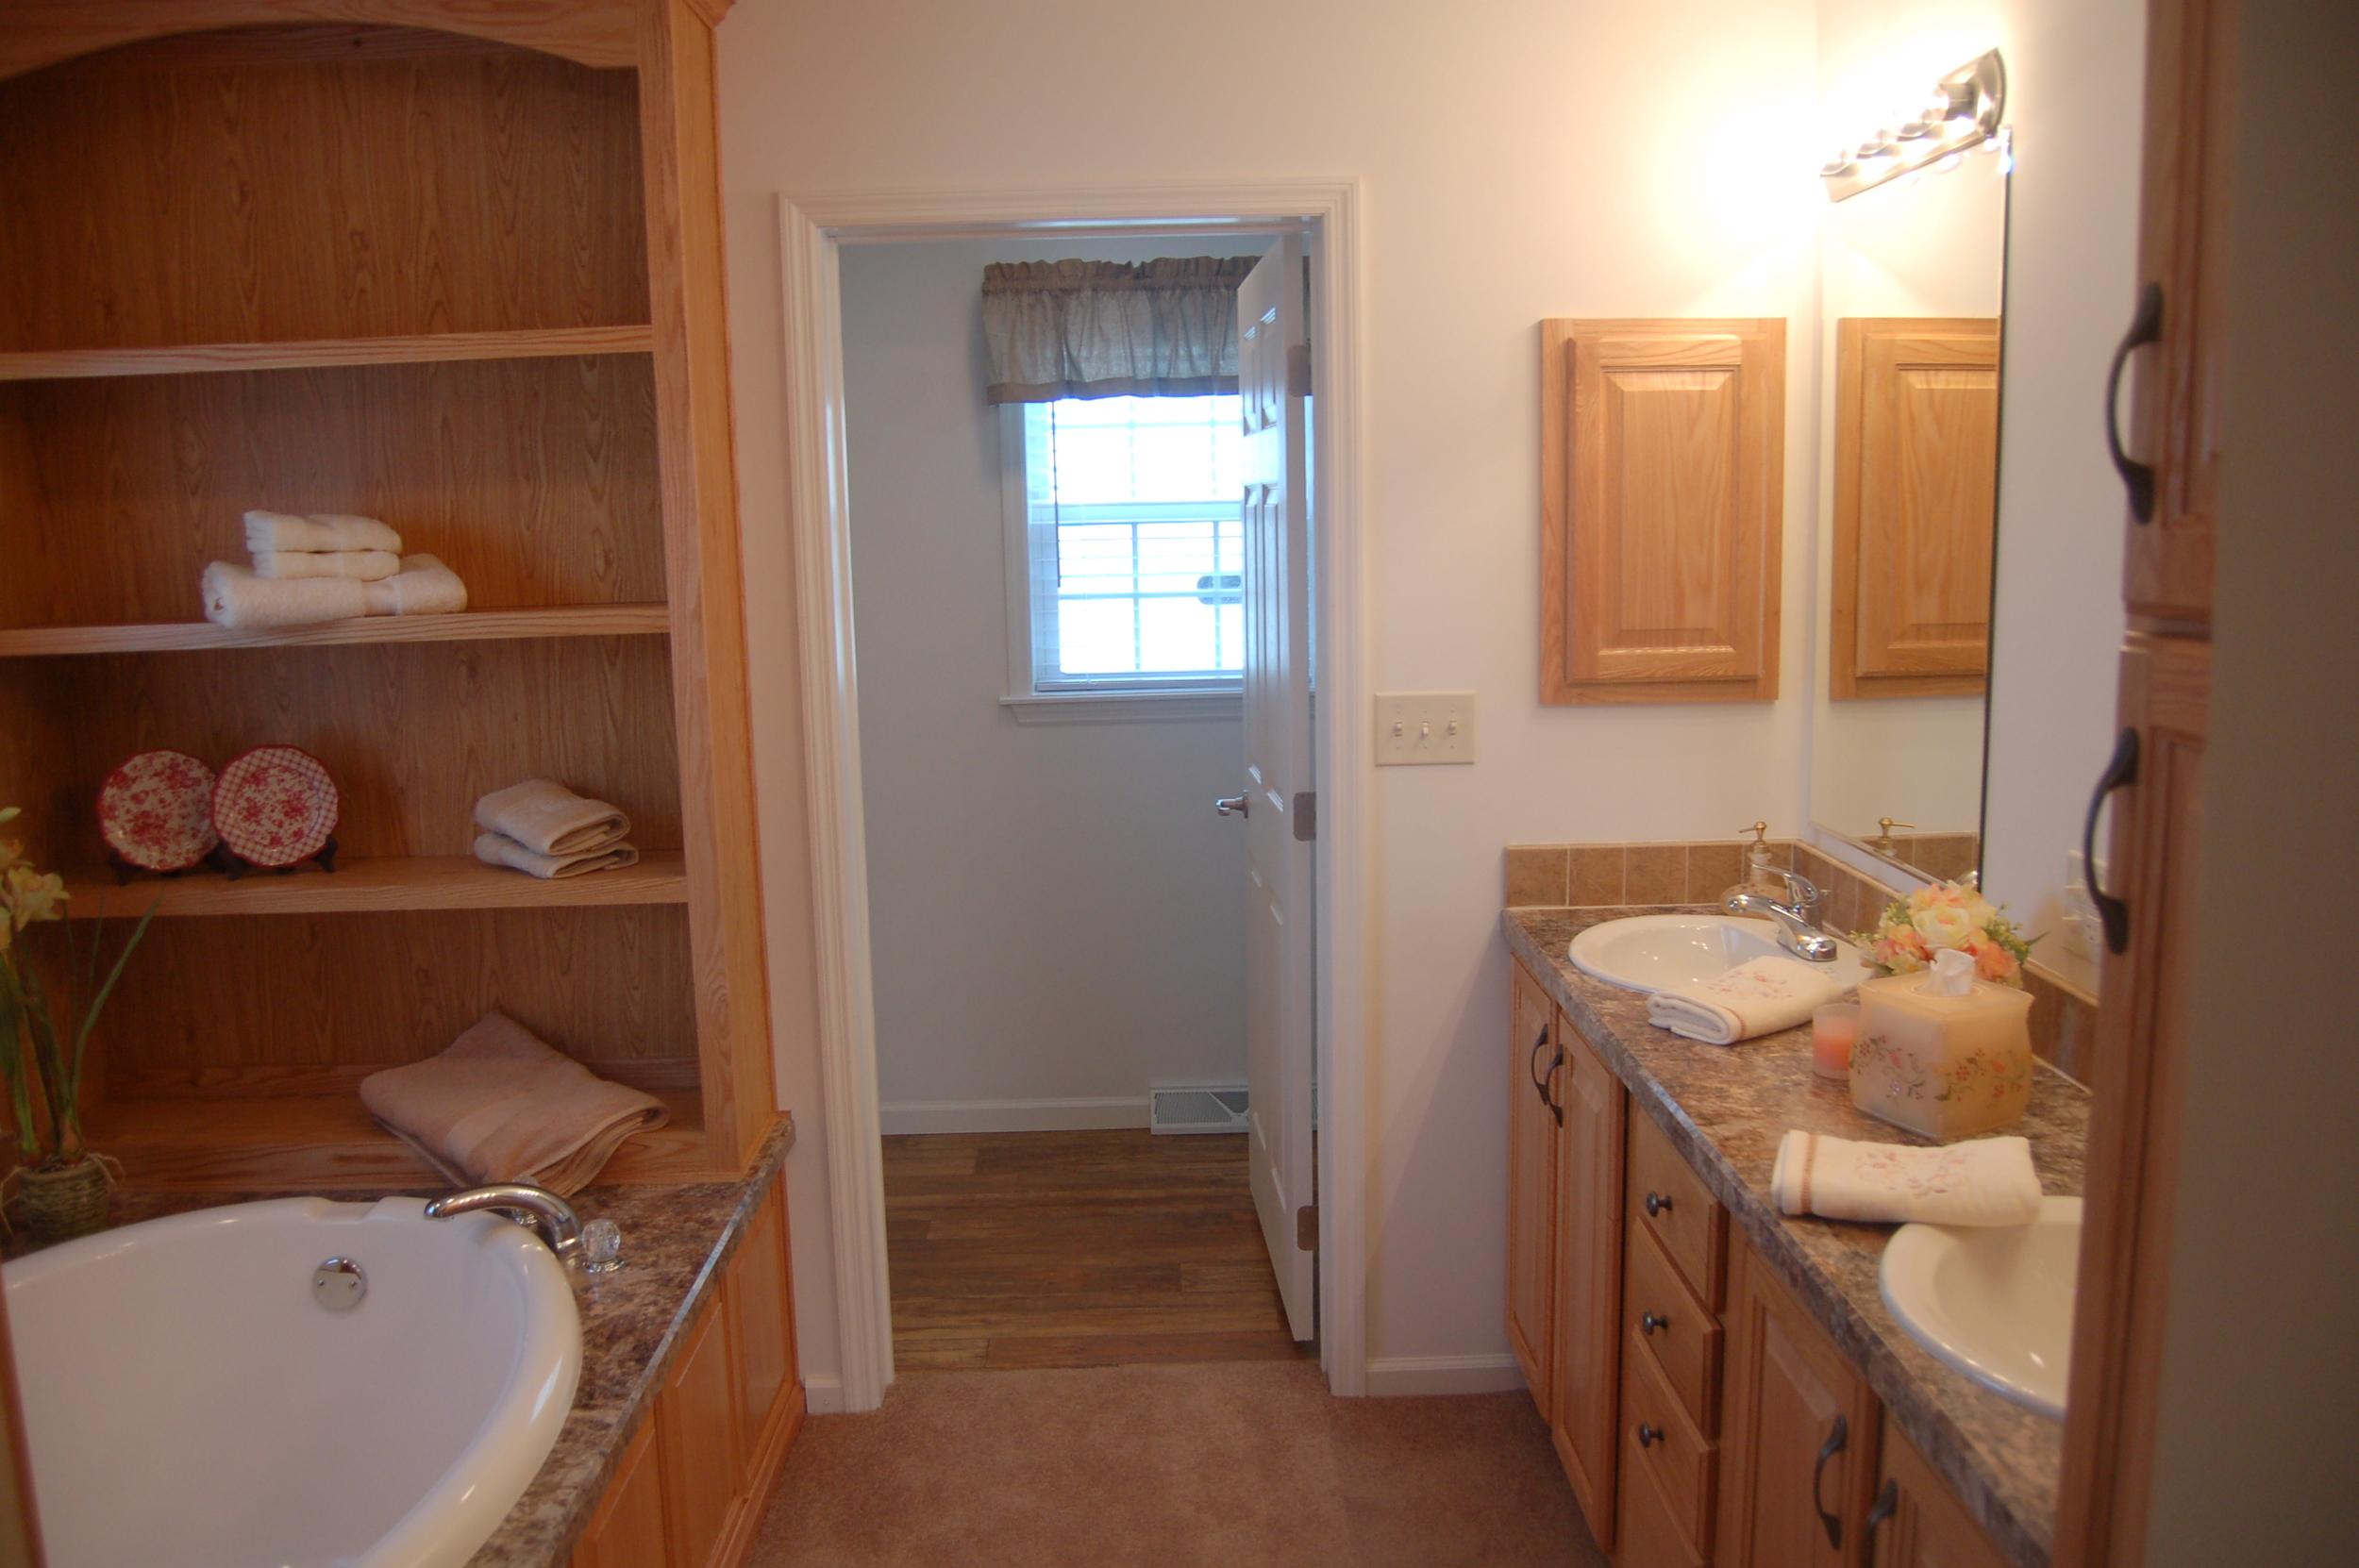 Master Bath Medicine Cabinet, Soaker Tub, and Decorative Shelving (Natural Oak Cabinetry)